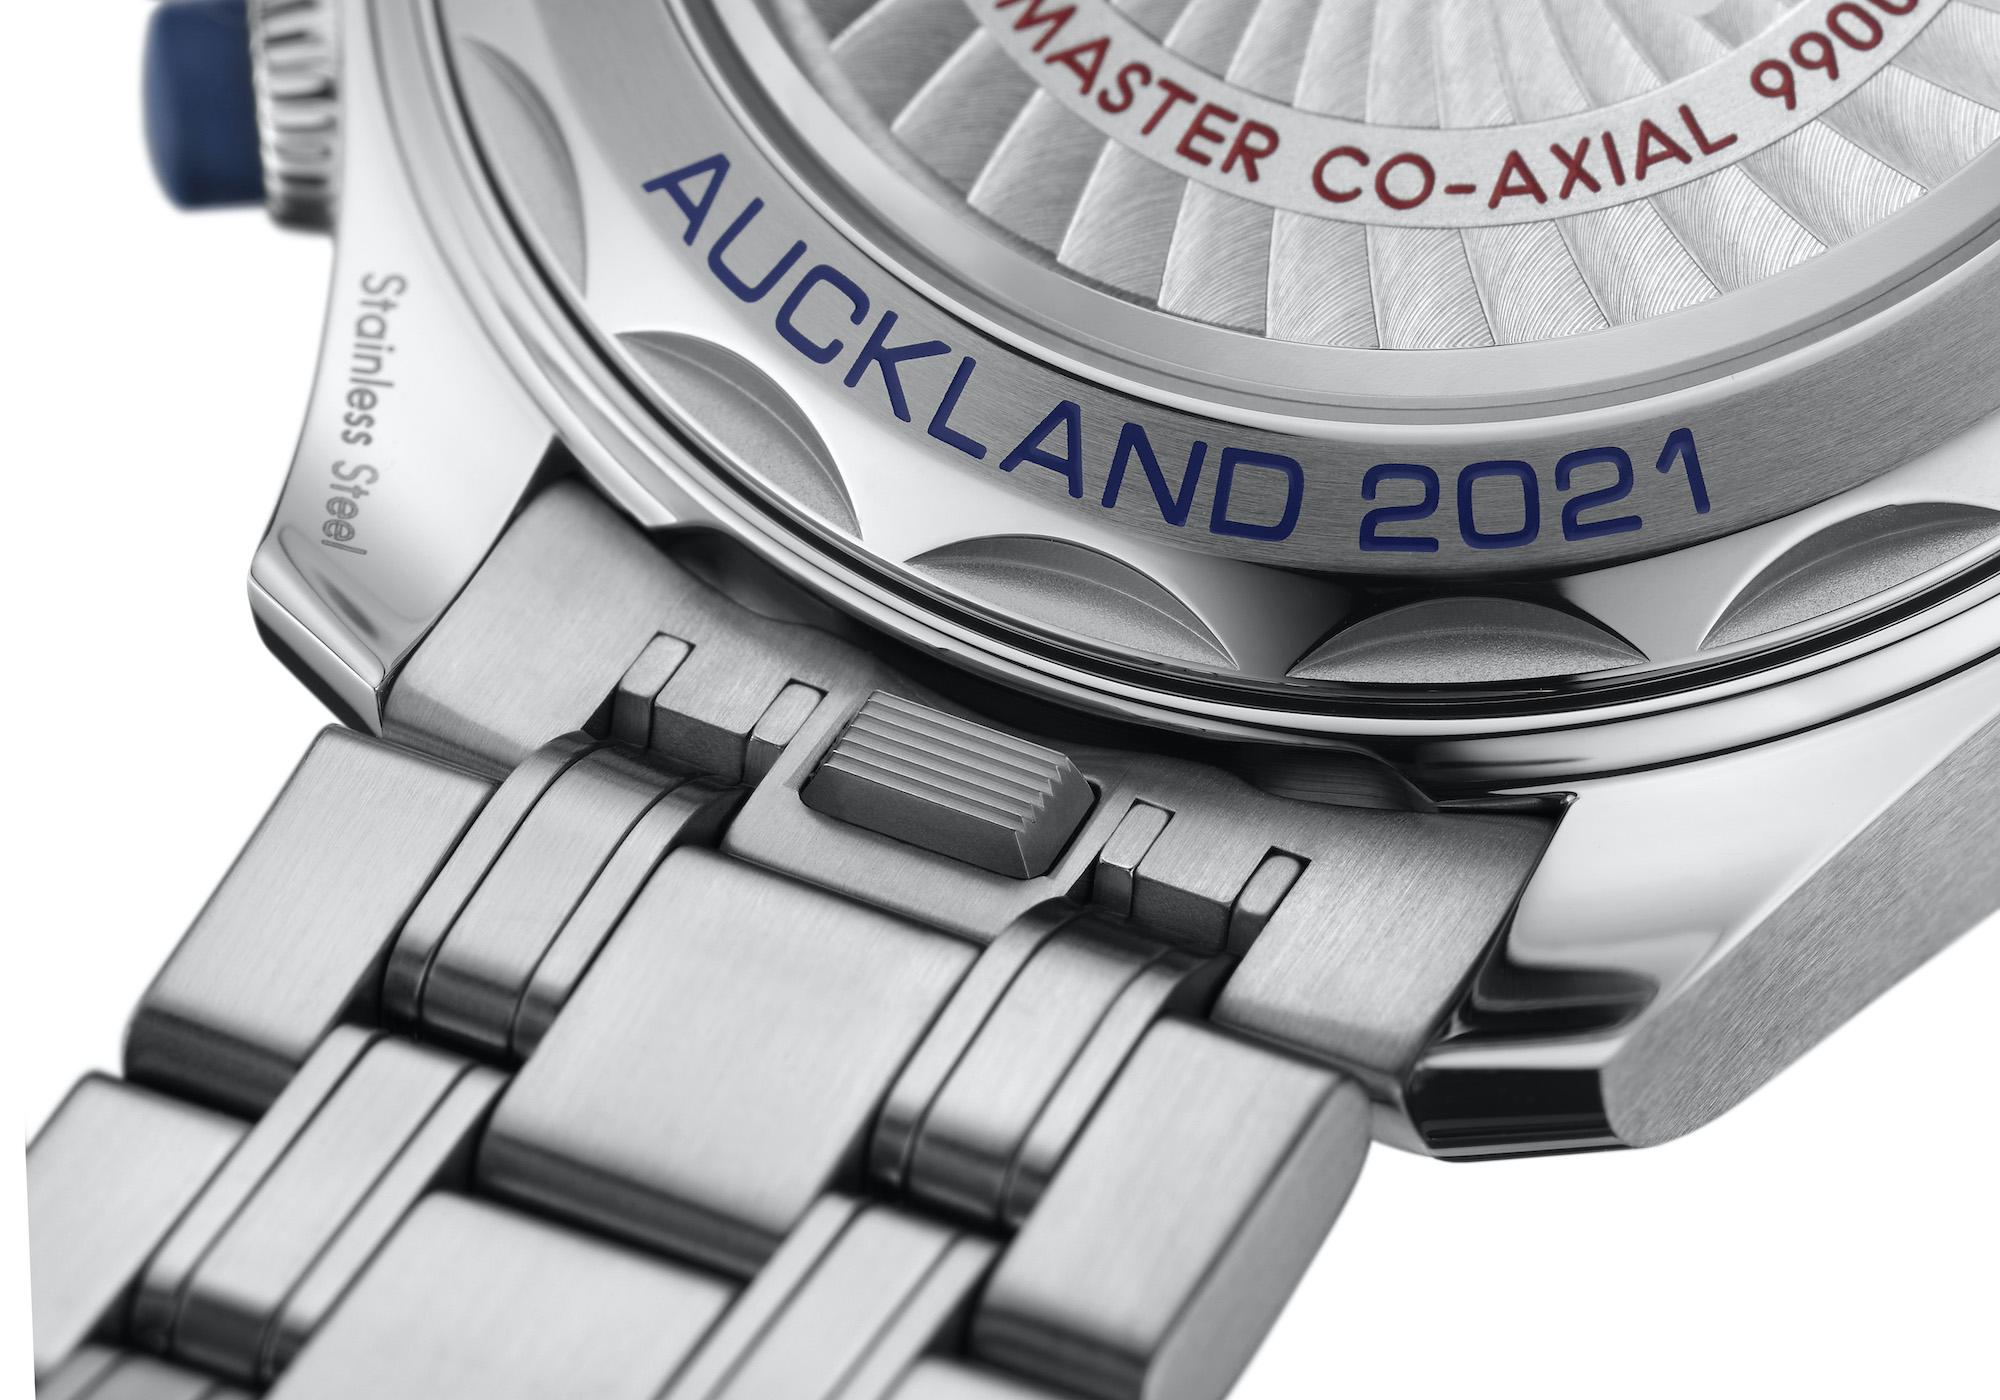 Omega Seamaster Diver 300M Americas Cup Chronograph 210.30.44.51.03.002 Detalle cambio de pulsera